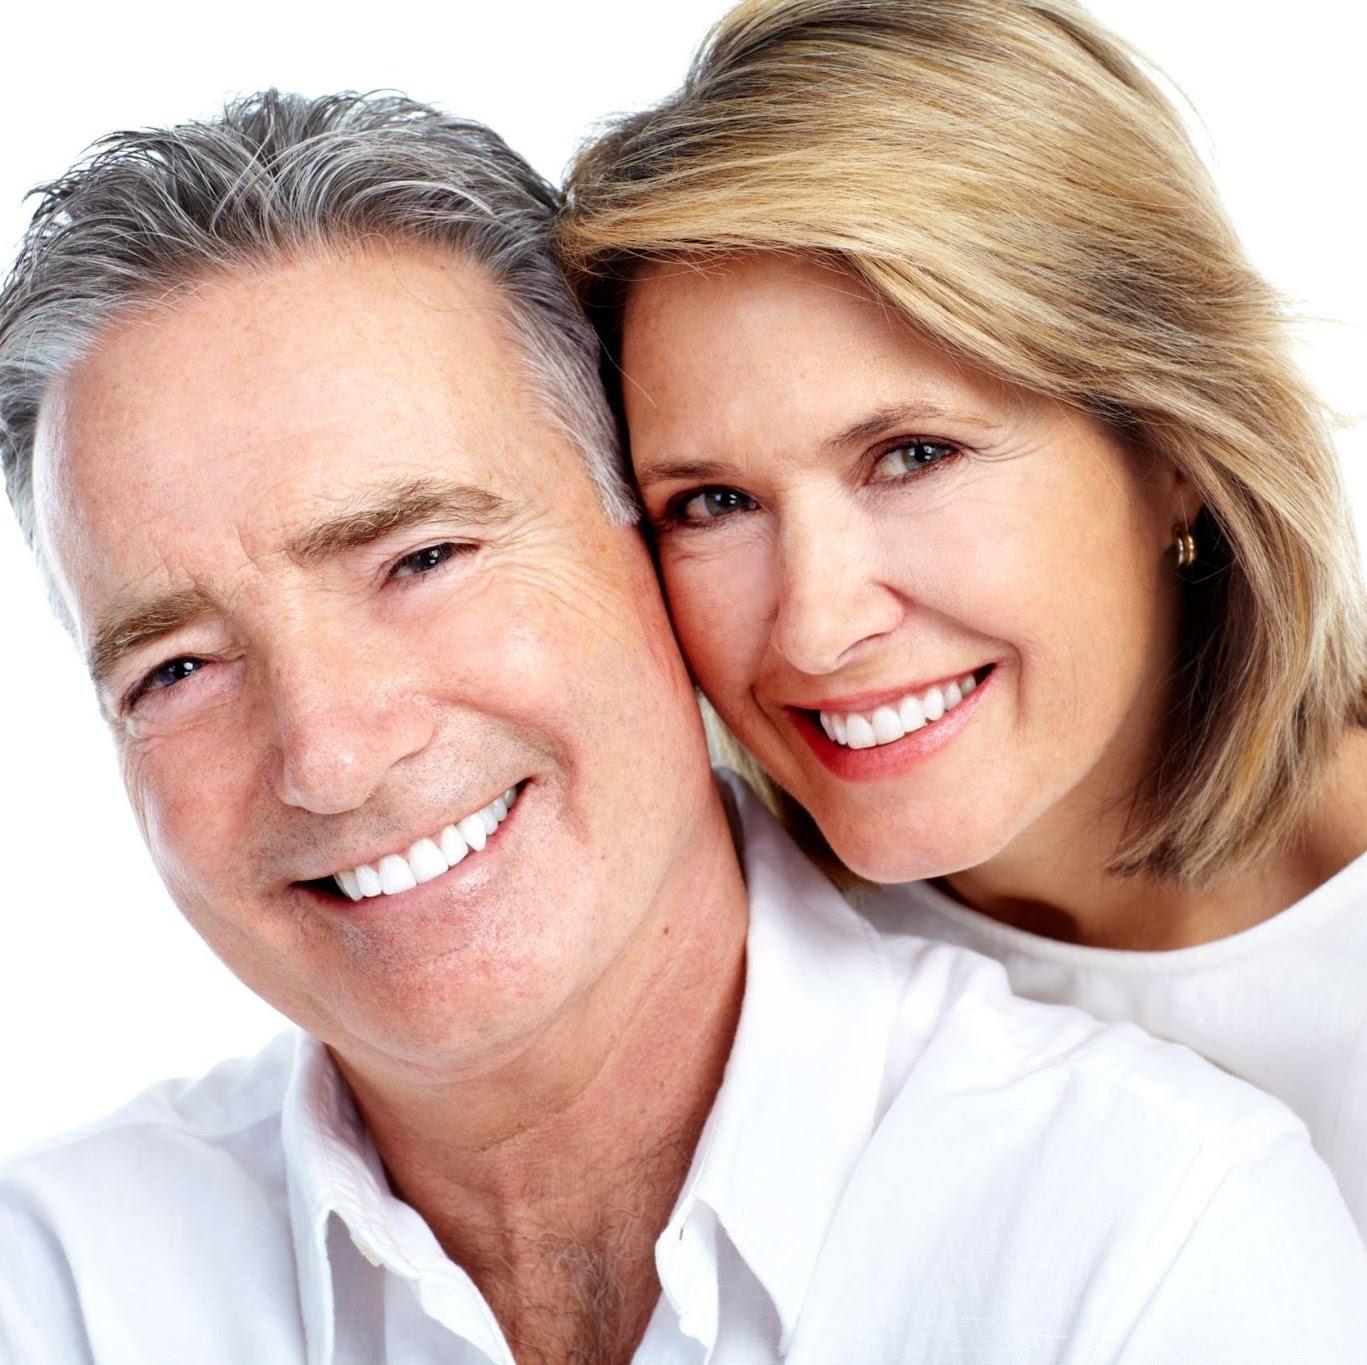 Texas Romanian Senior Online Dating Service